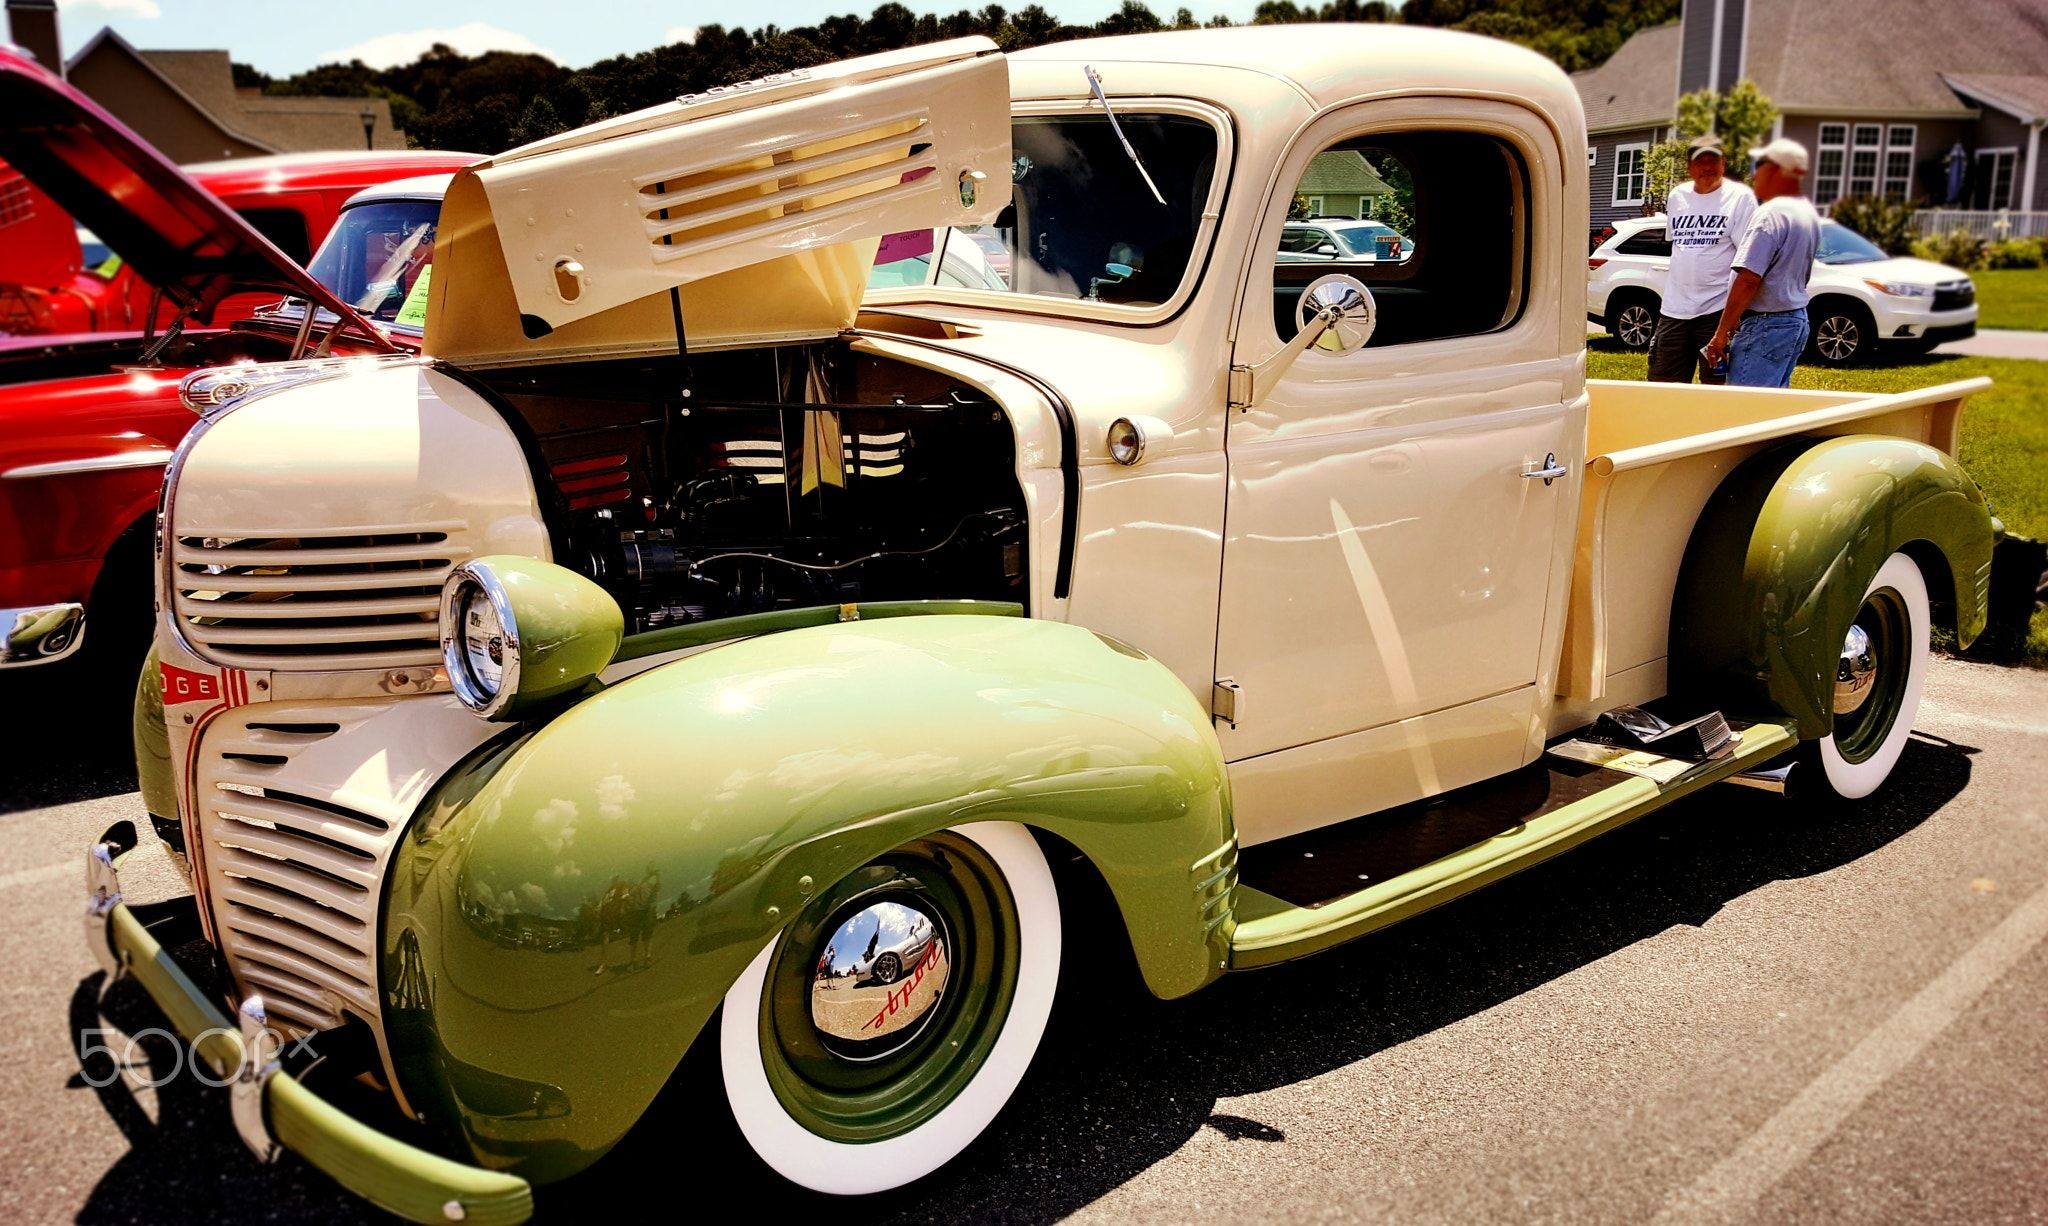 Old two-tone Dodge Pickup Truck | Millsboro, DE - Antique/vintage ...